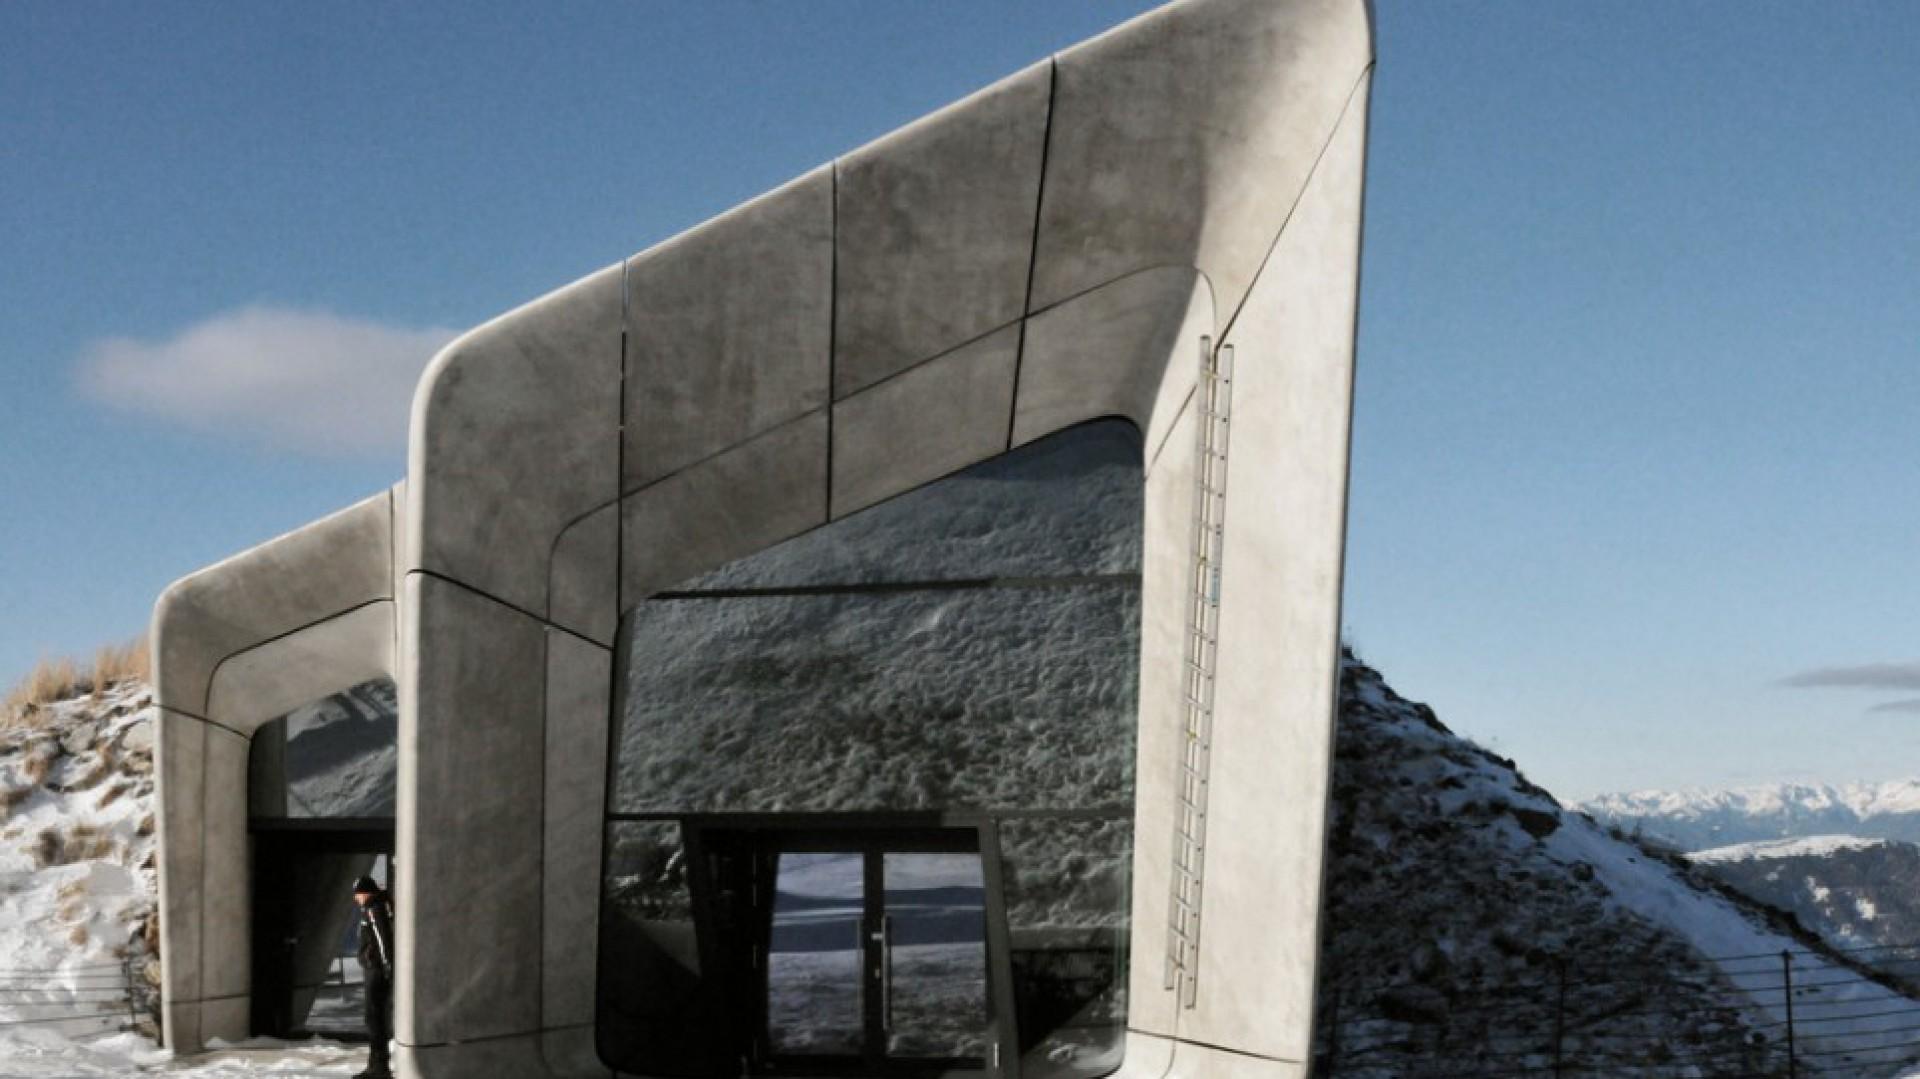 IT Messner Mountain Museum Corones fot. mat. prasowe Rockfon